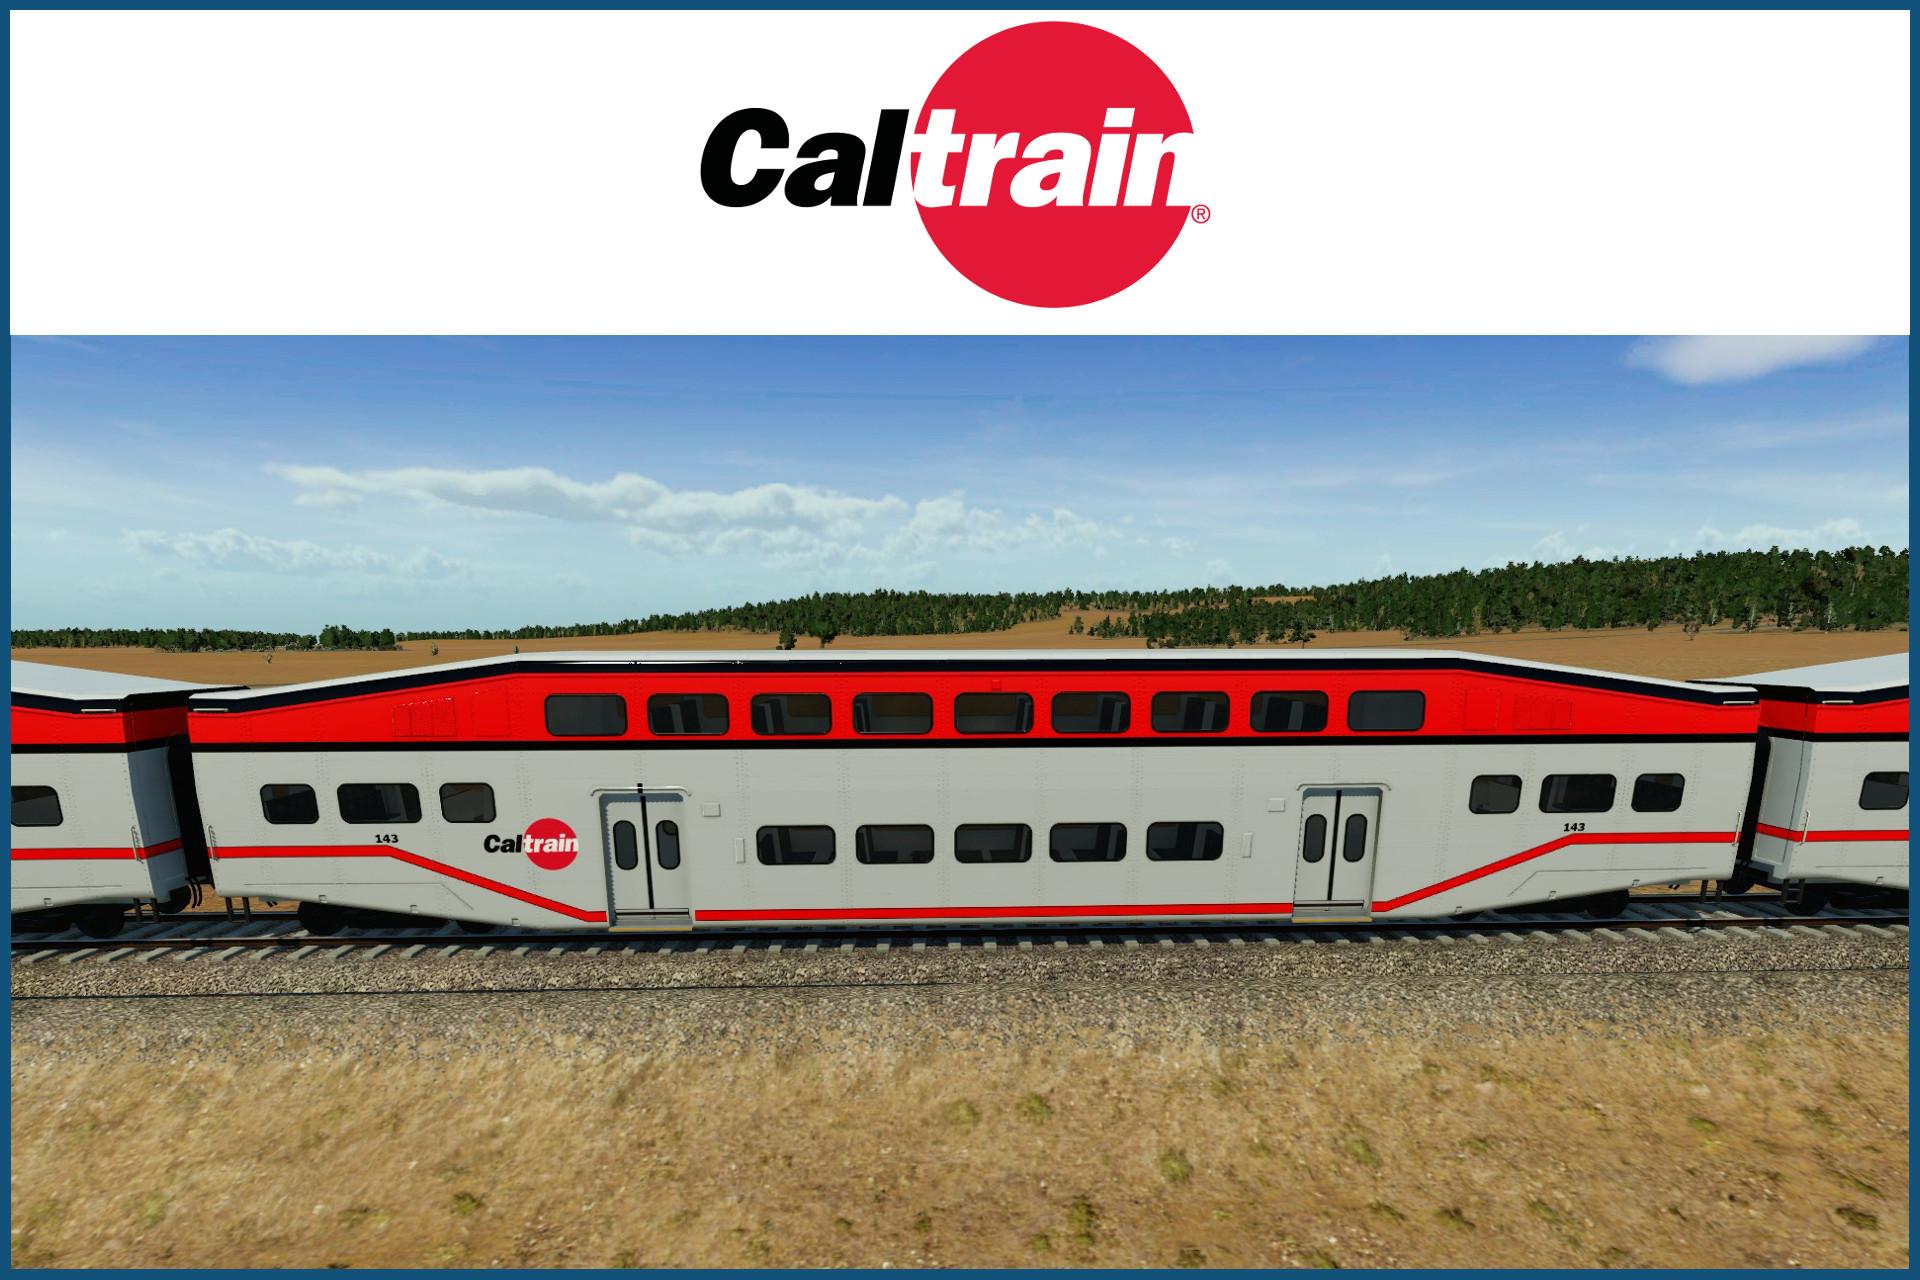 Transport Fever 2 - Caltrain Bombardier Bi-Level Coach